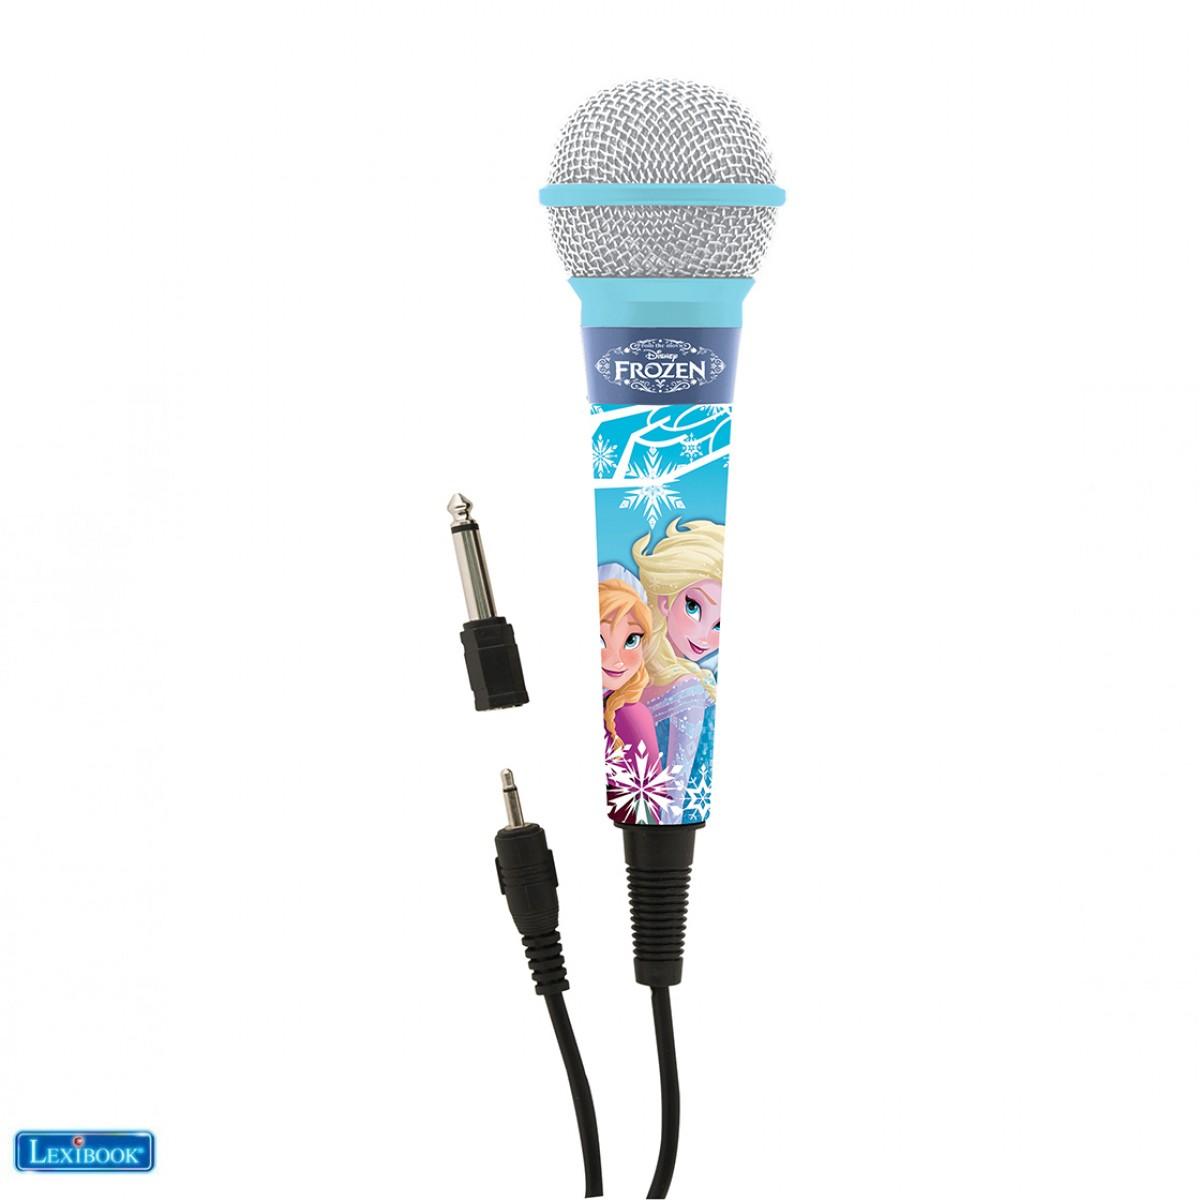 Lexibook - MIC100FZ - Microphone La Reine des Neiges